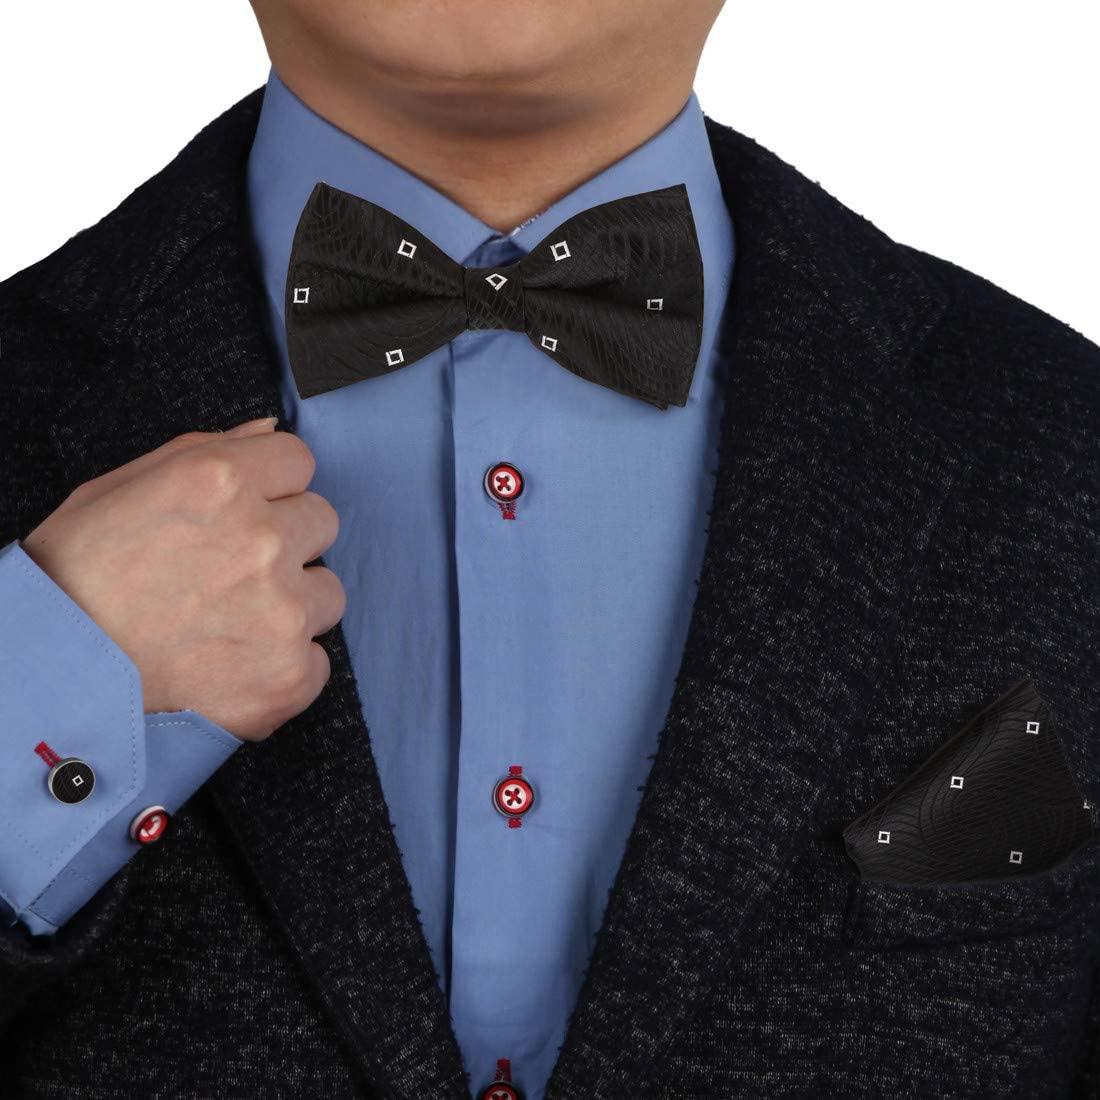 Epoint Mens Fashion Multicolored Patterned Silk Pre-tied Bowtie Cufflink Hanky Set